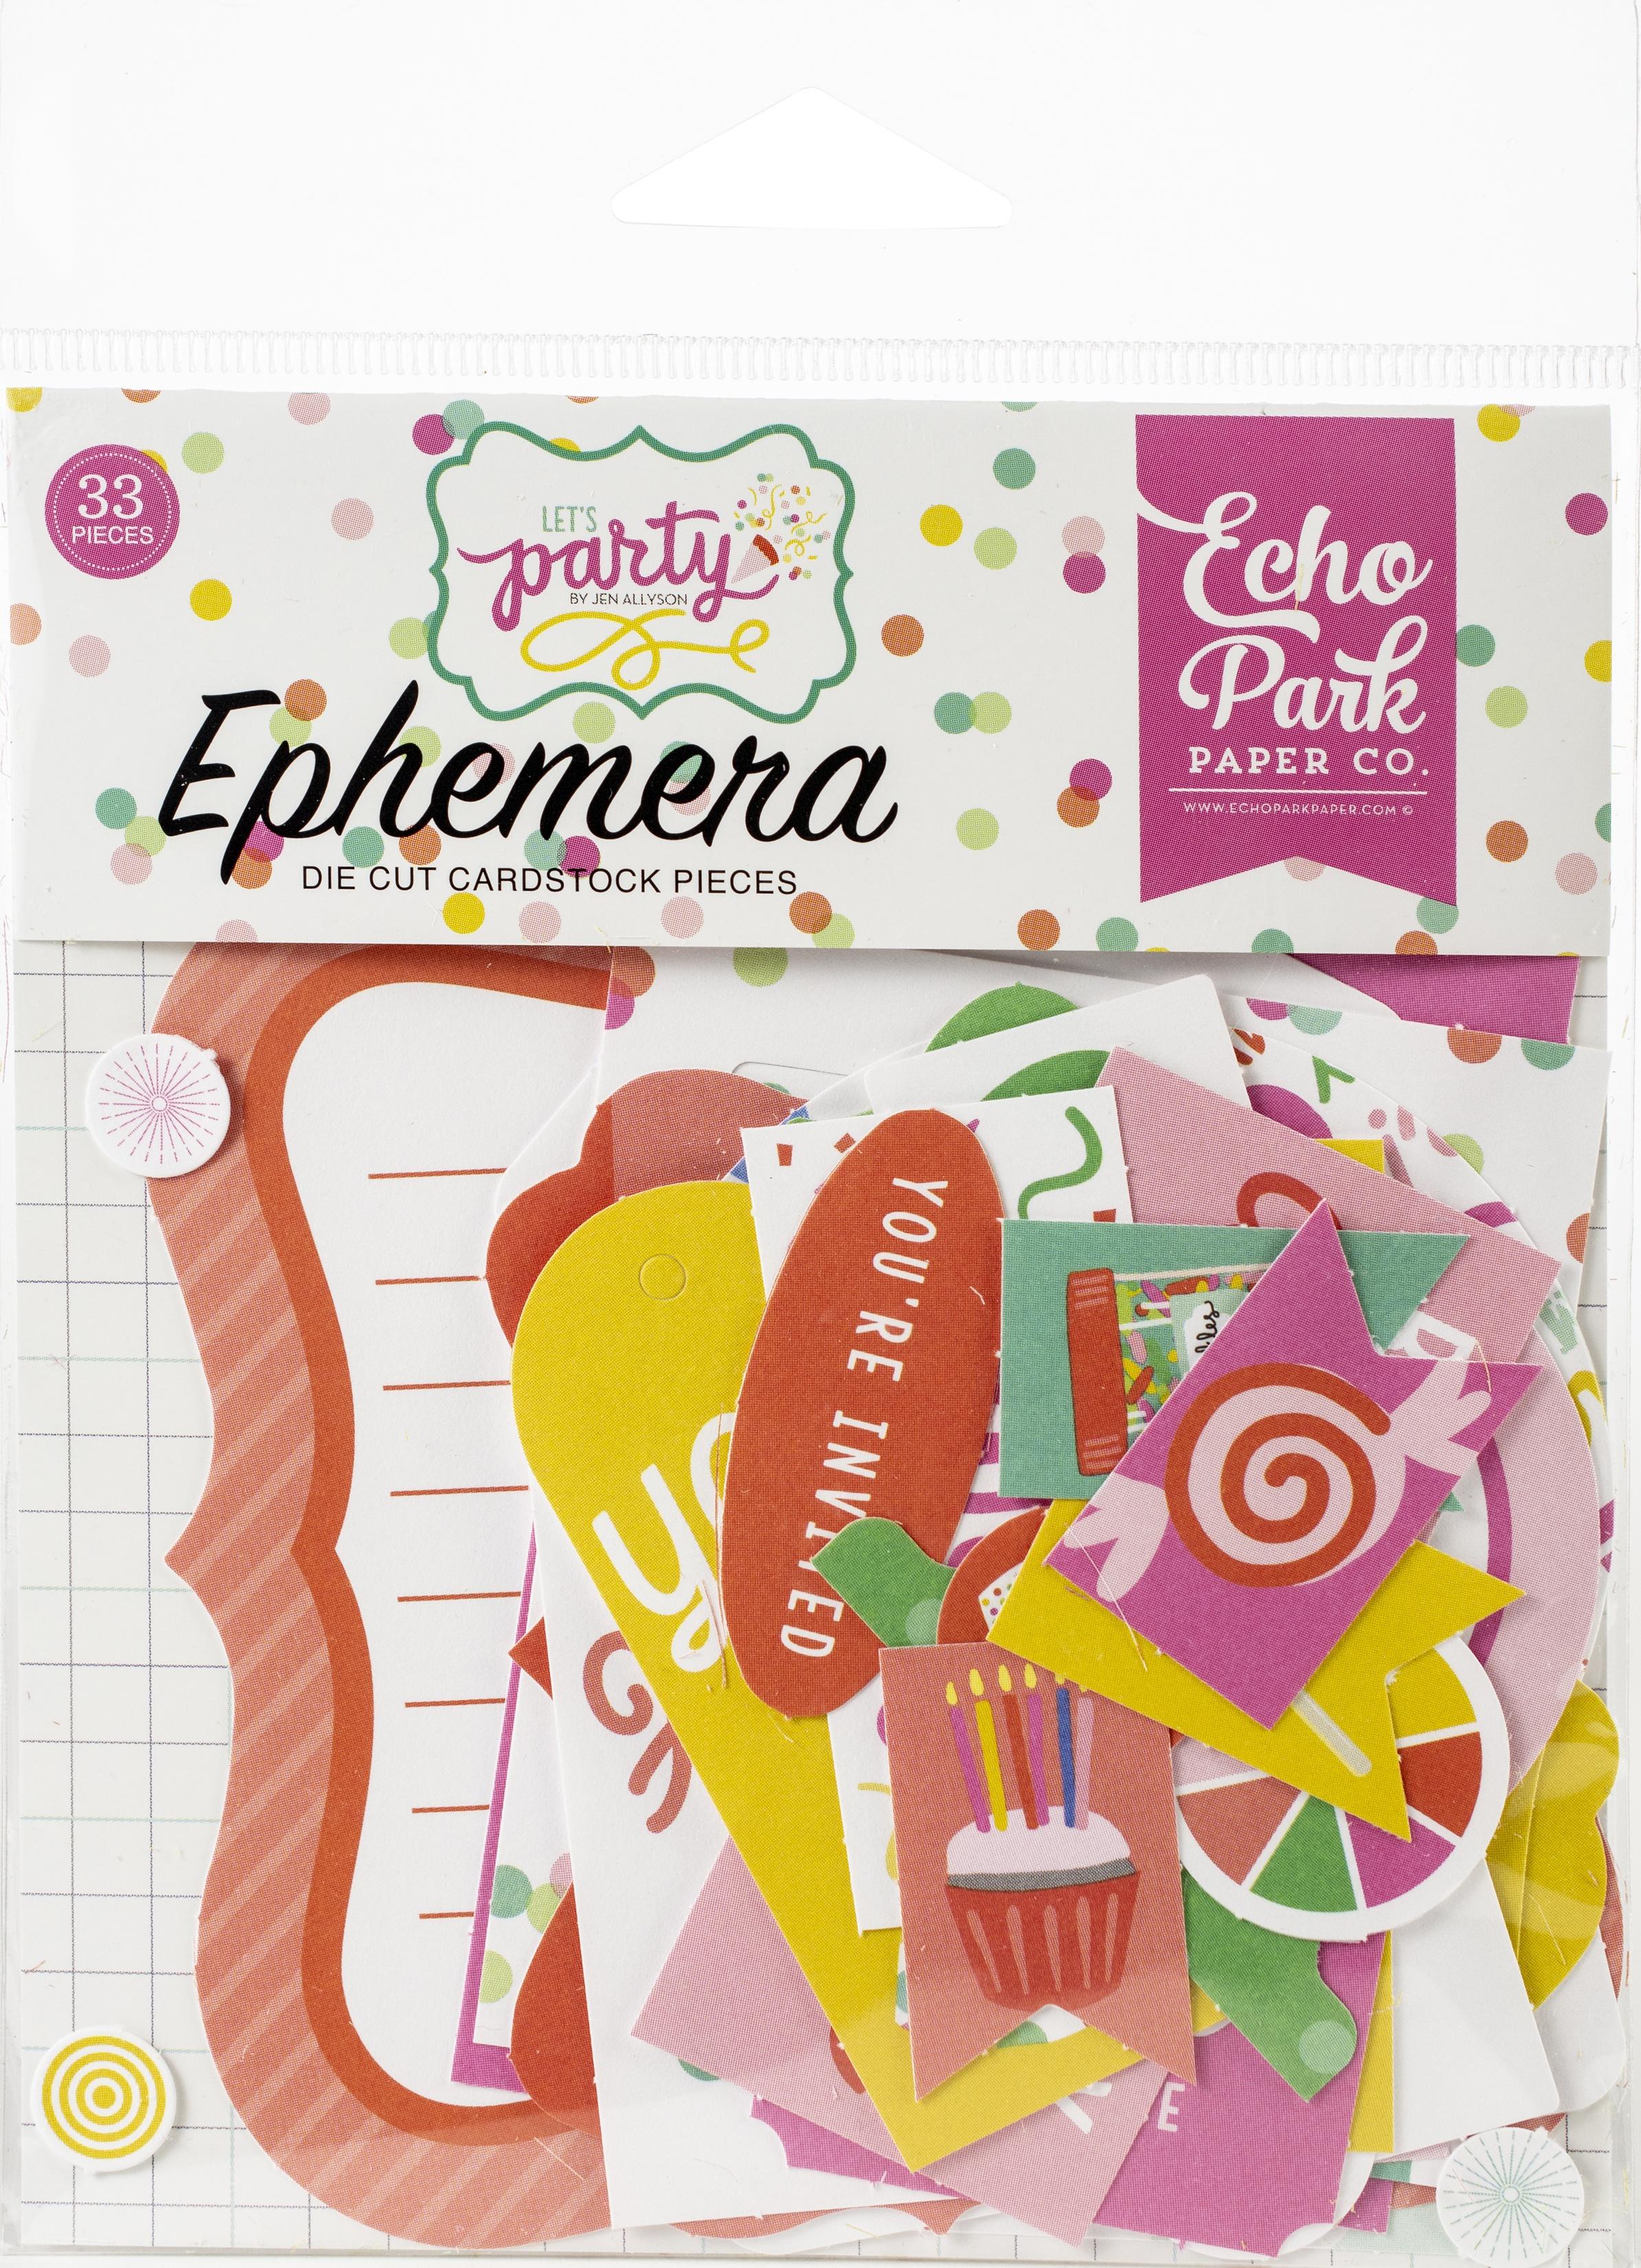 Let's Party - Ephemera